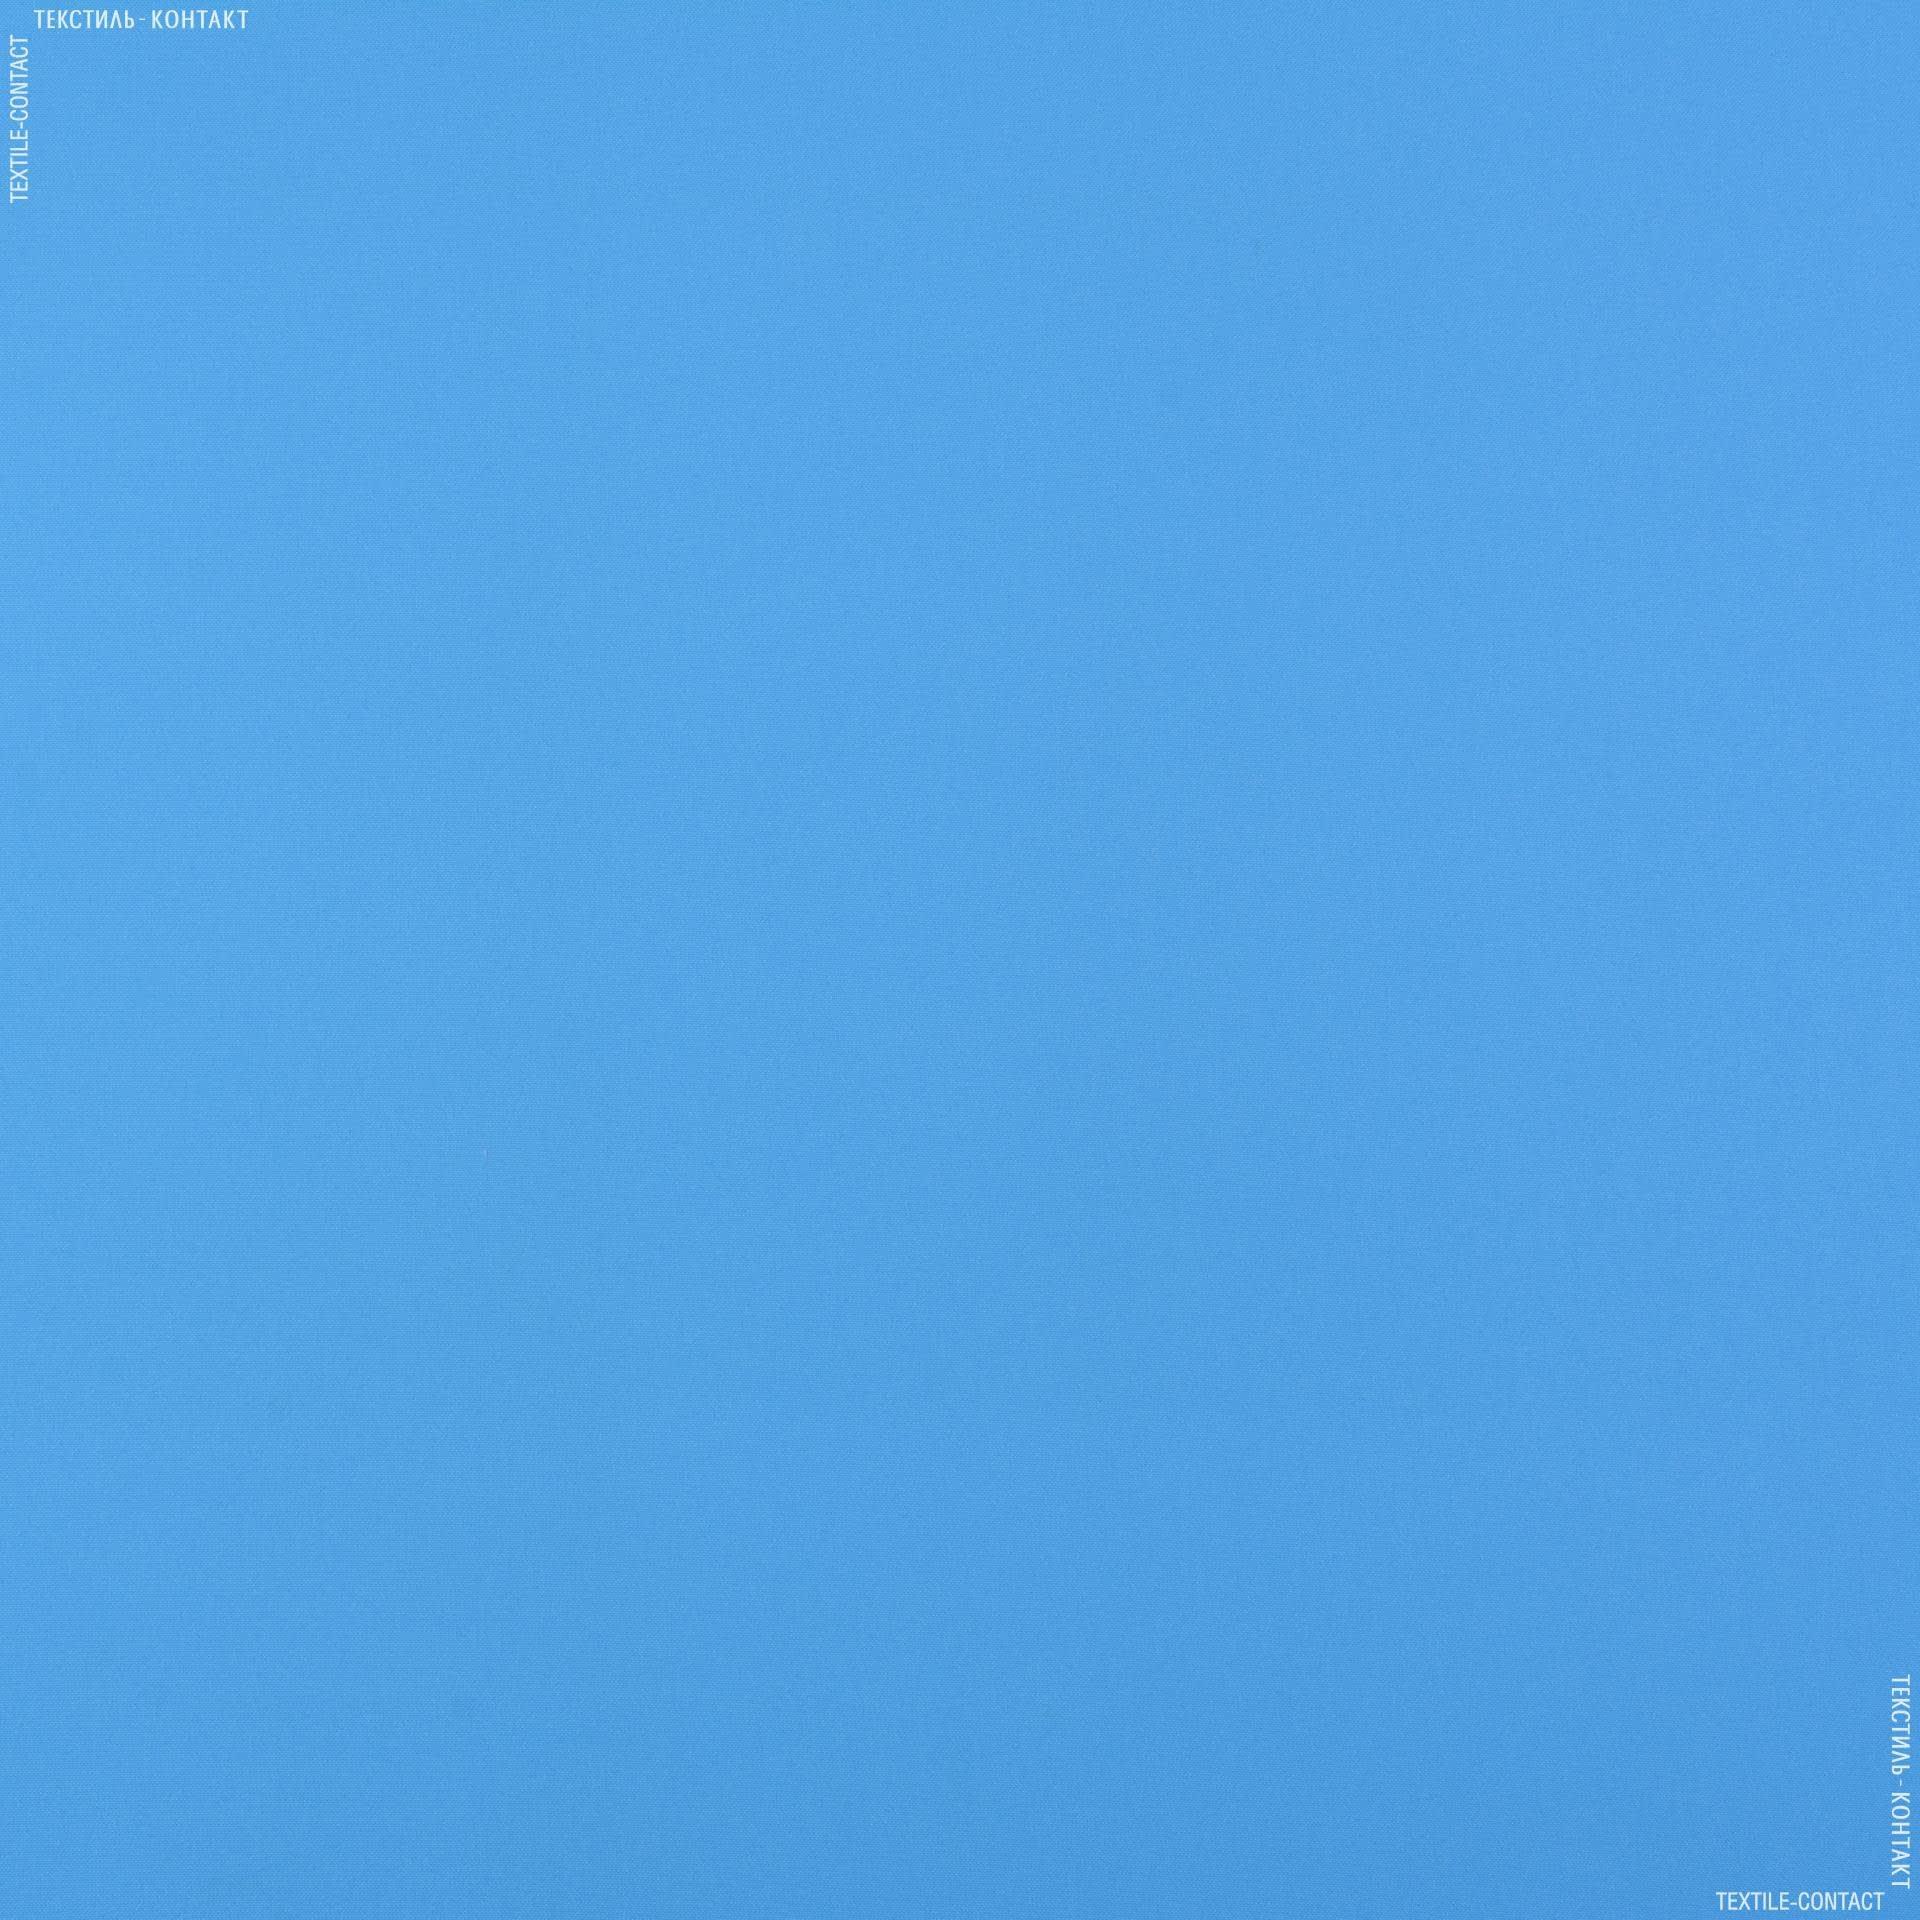 Ткани все ткани - Габардин небесно-голубой